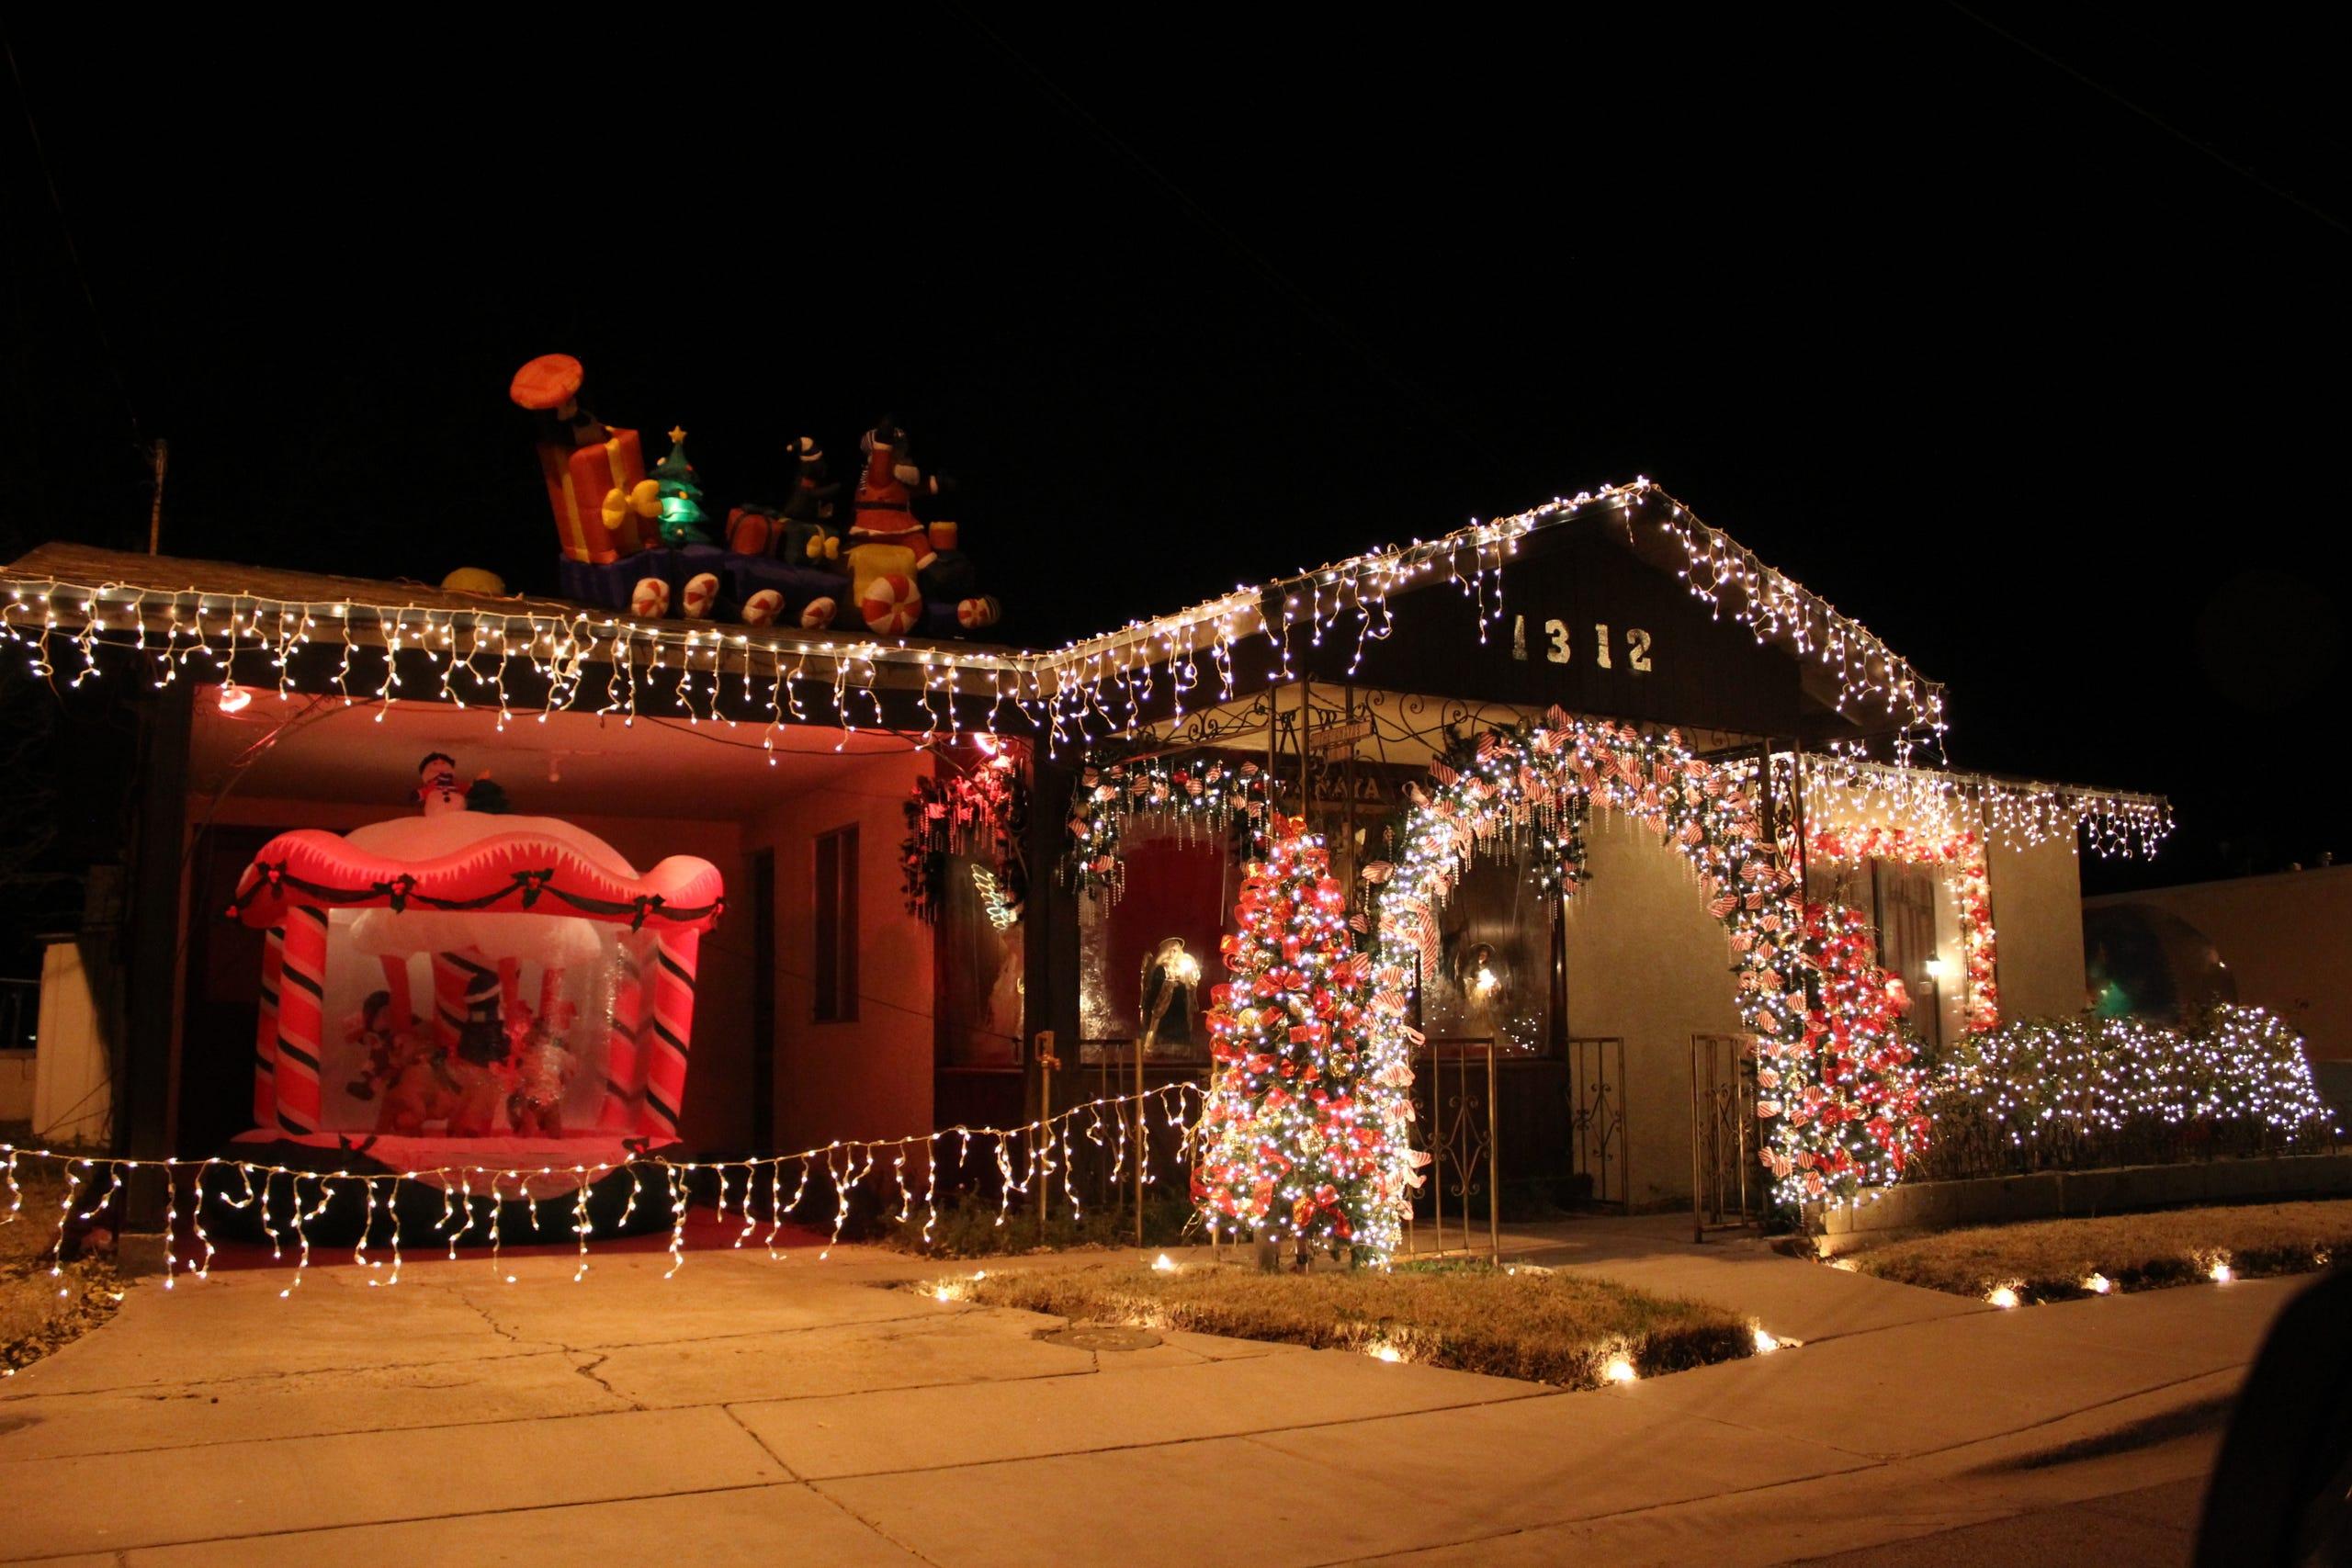 Las Cruces Sun News Christmas Lights 2020 2018 must see Christmas light displays in Las Cruces